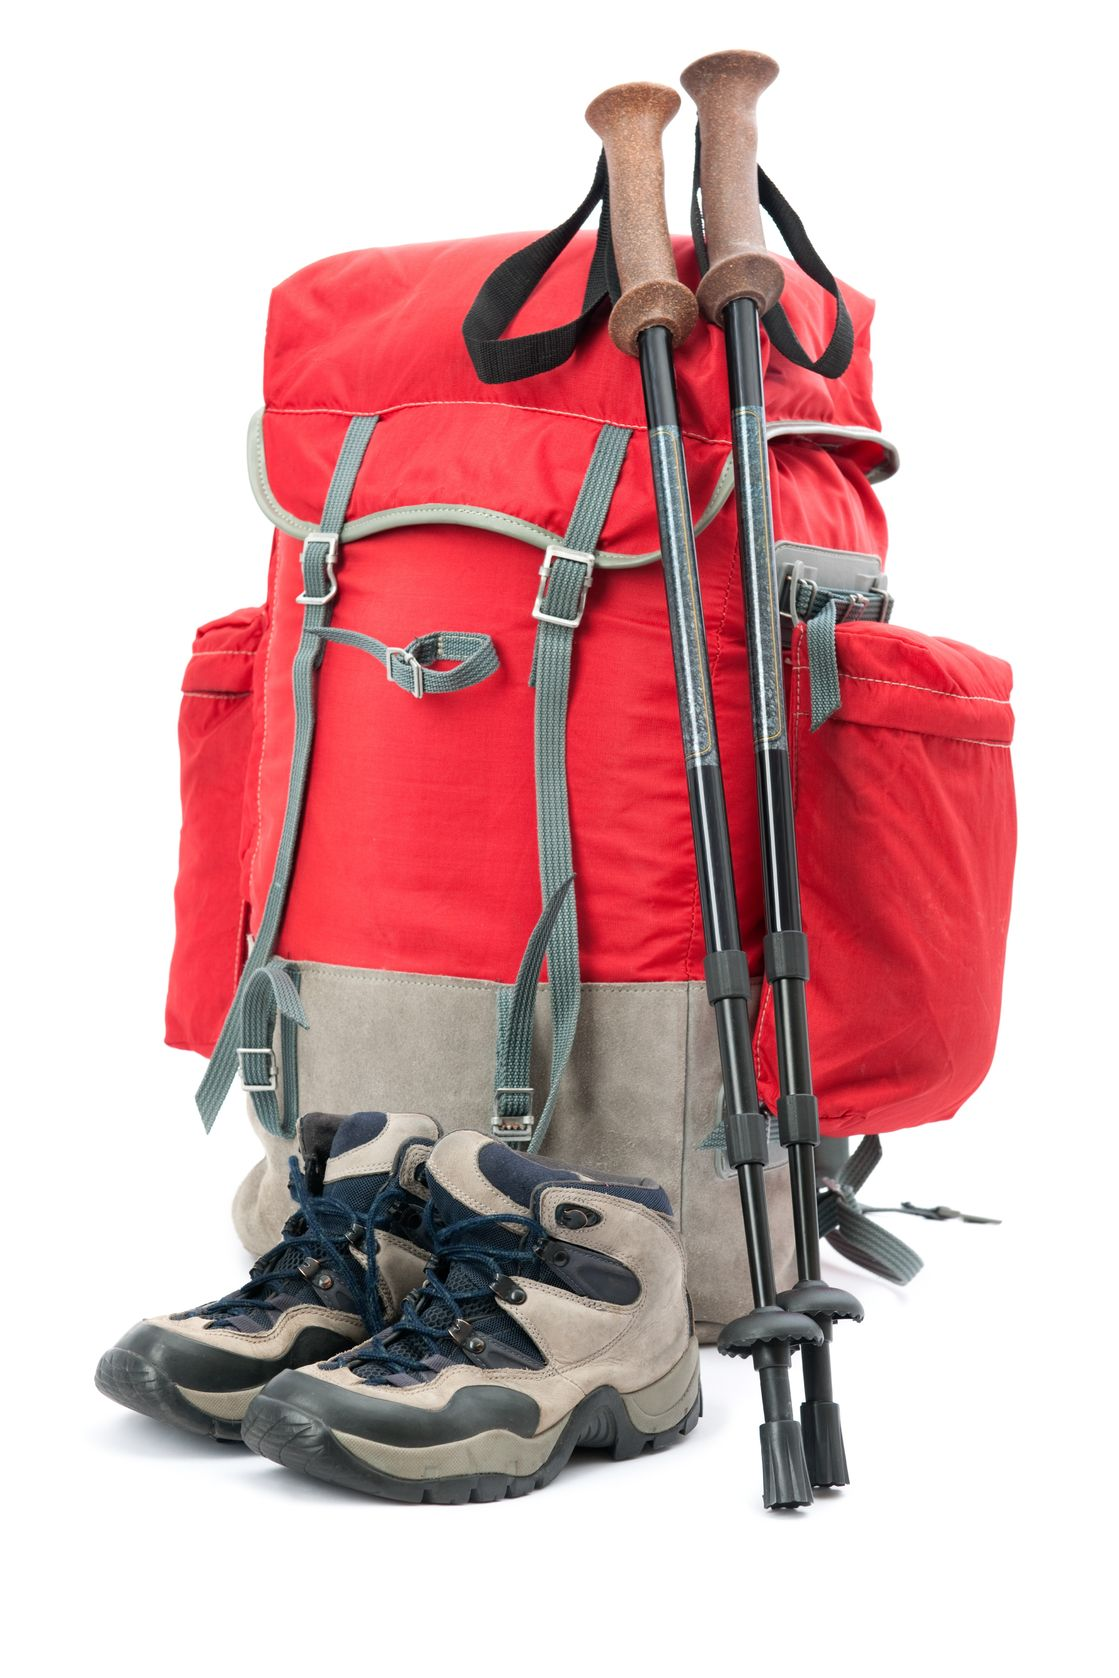 7376245 - hiking equipment, rucksack and boots